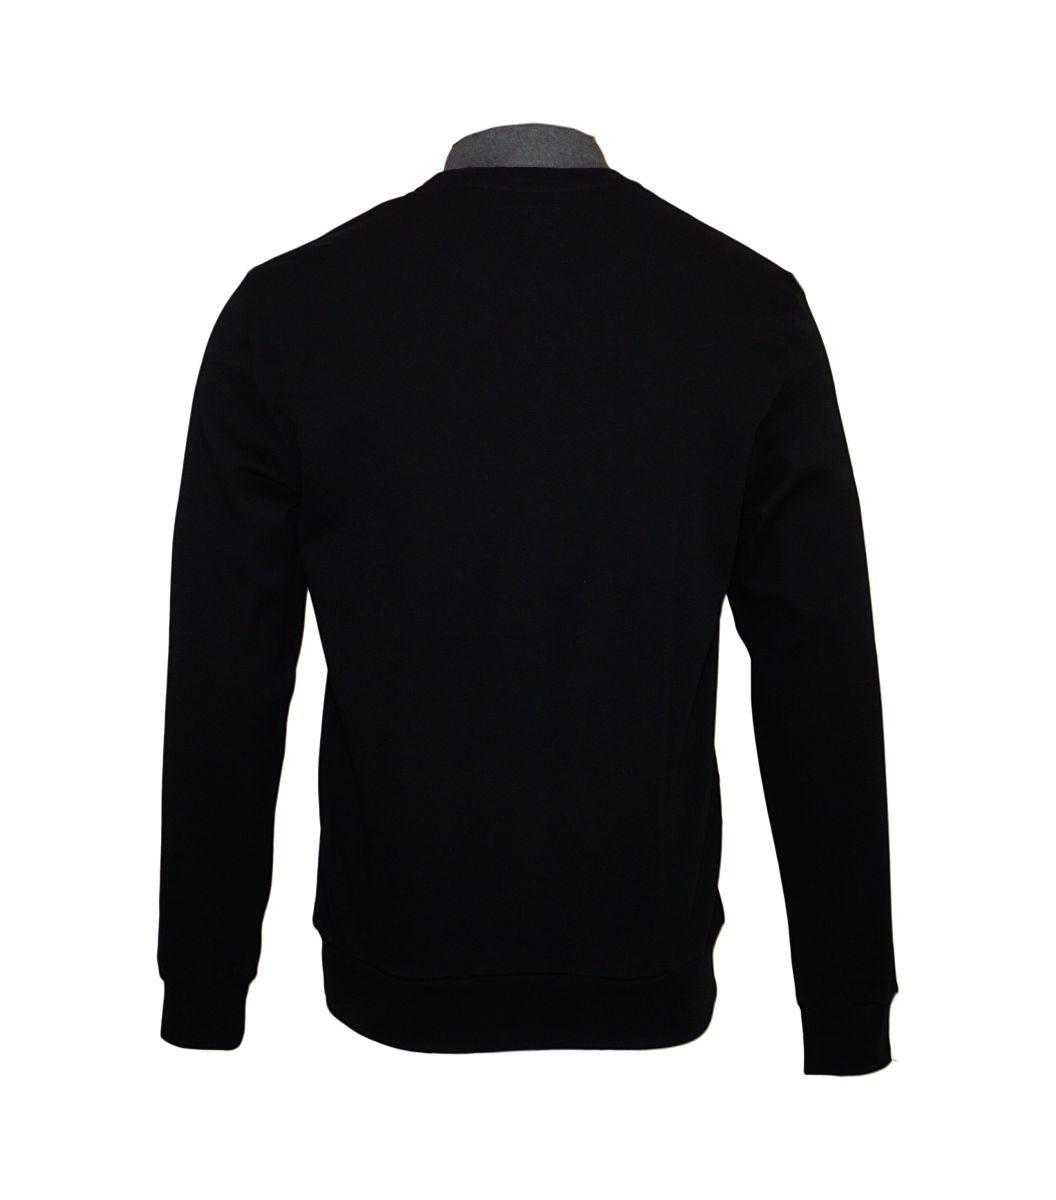 Emporio Armani Pullover Rundhals Sweater 111437 7A561 00020 NERO HW17-EAS1